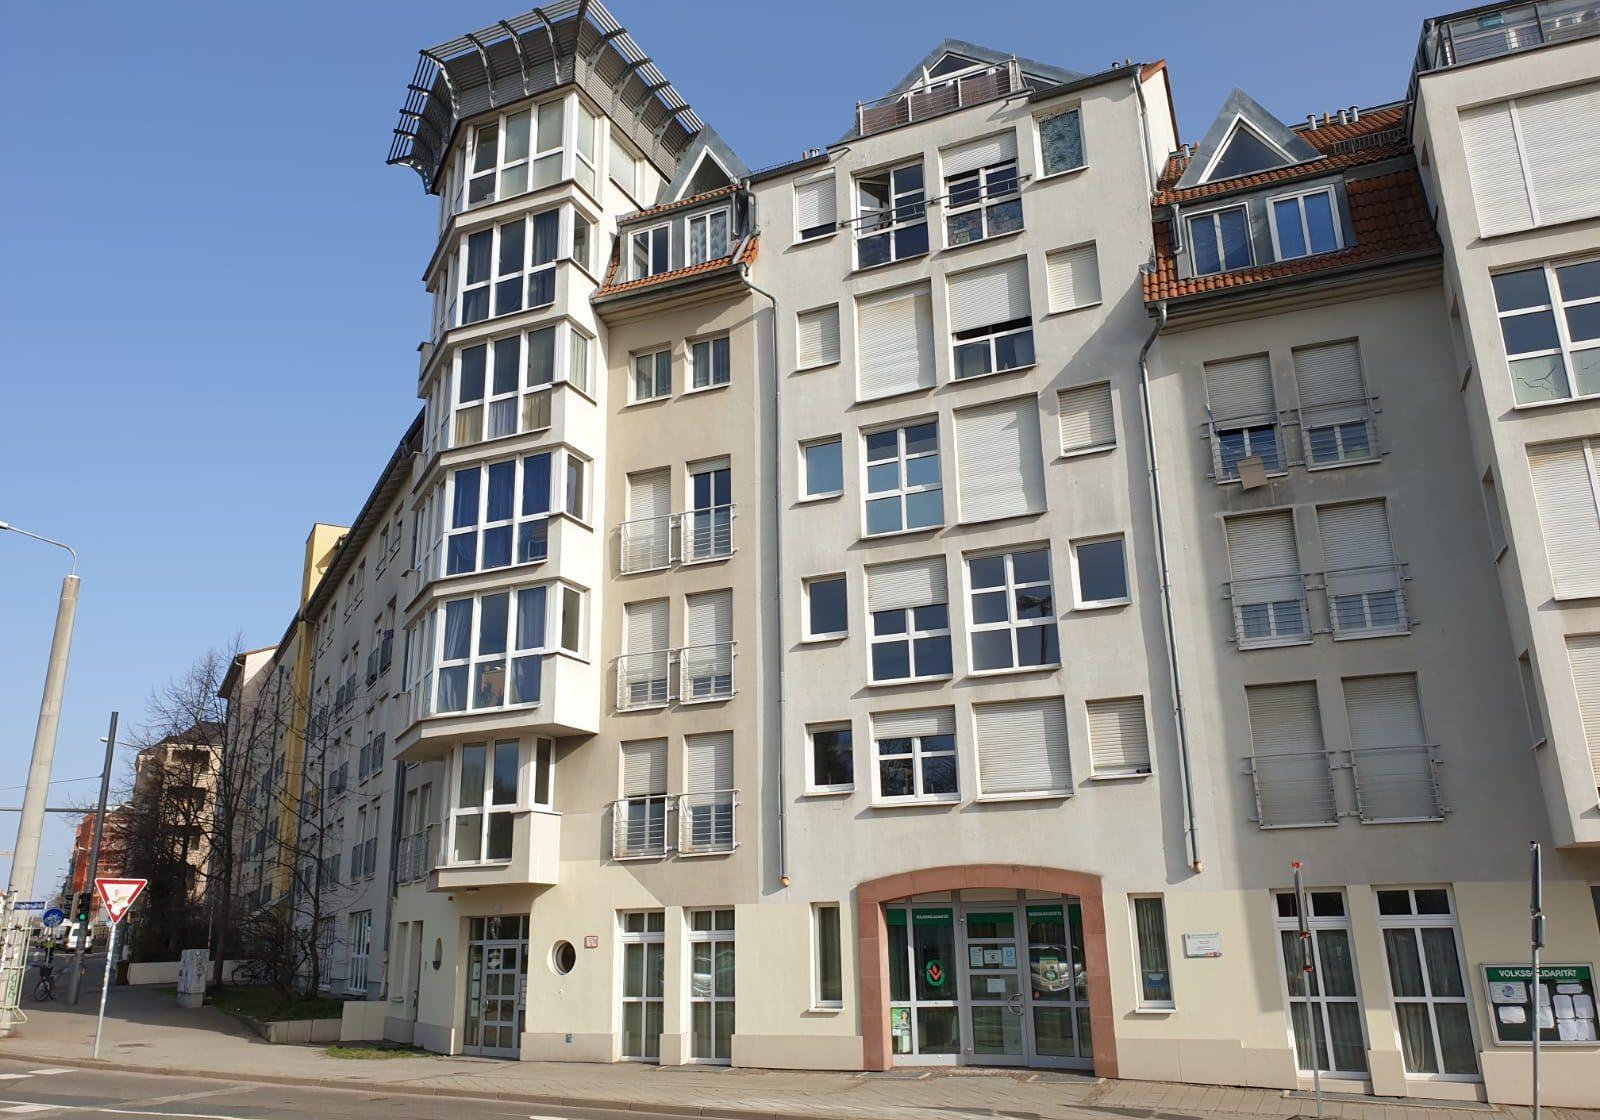 Leipzig, Prinz-Eugen-Straße 1